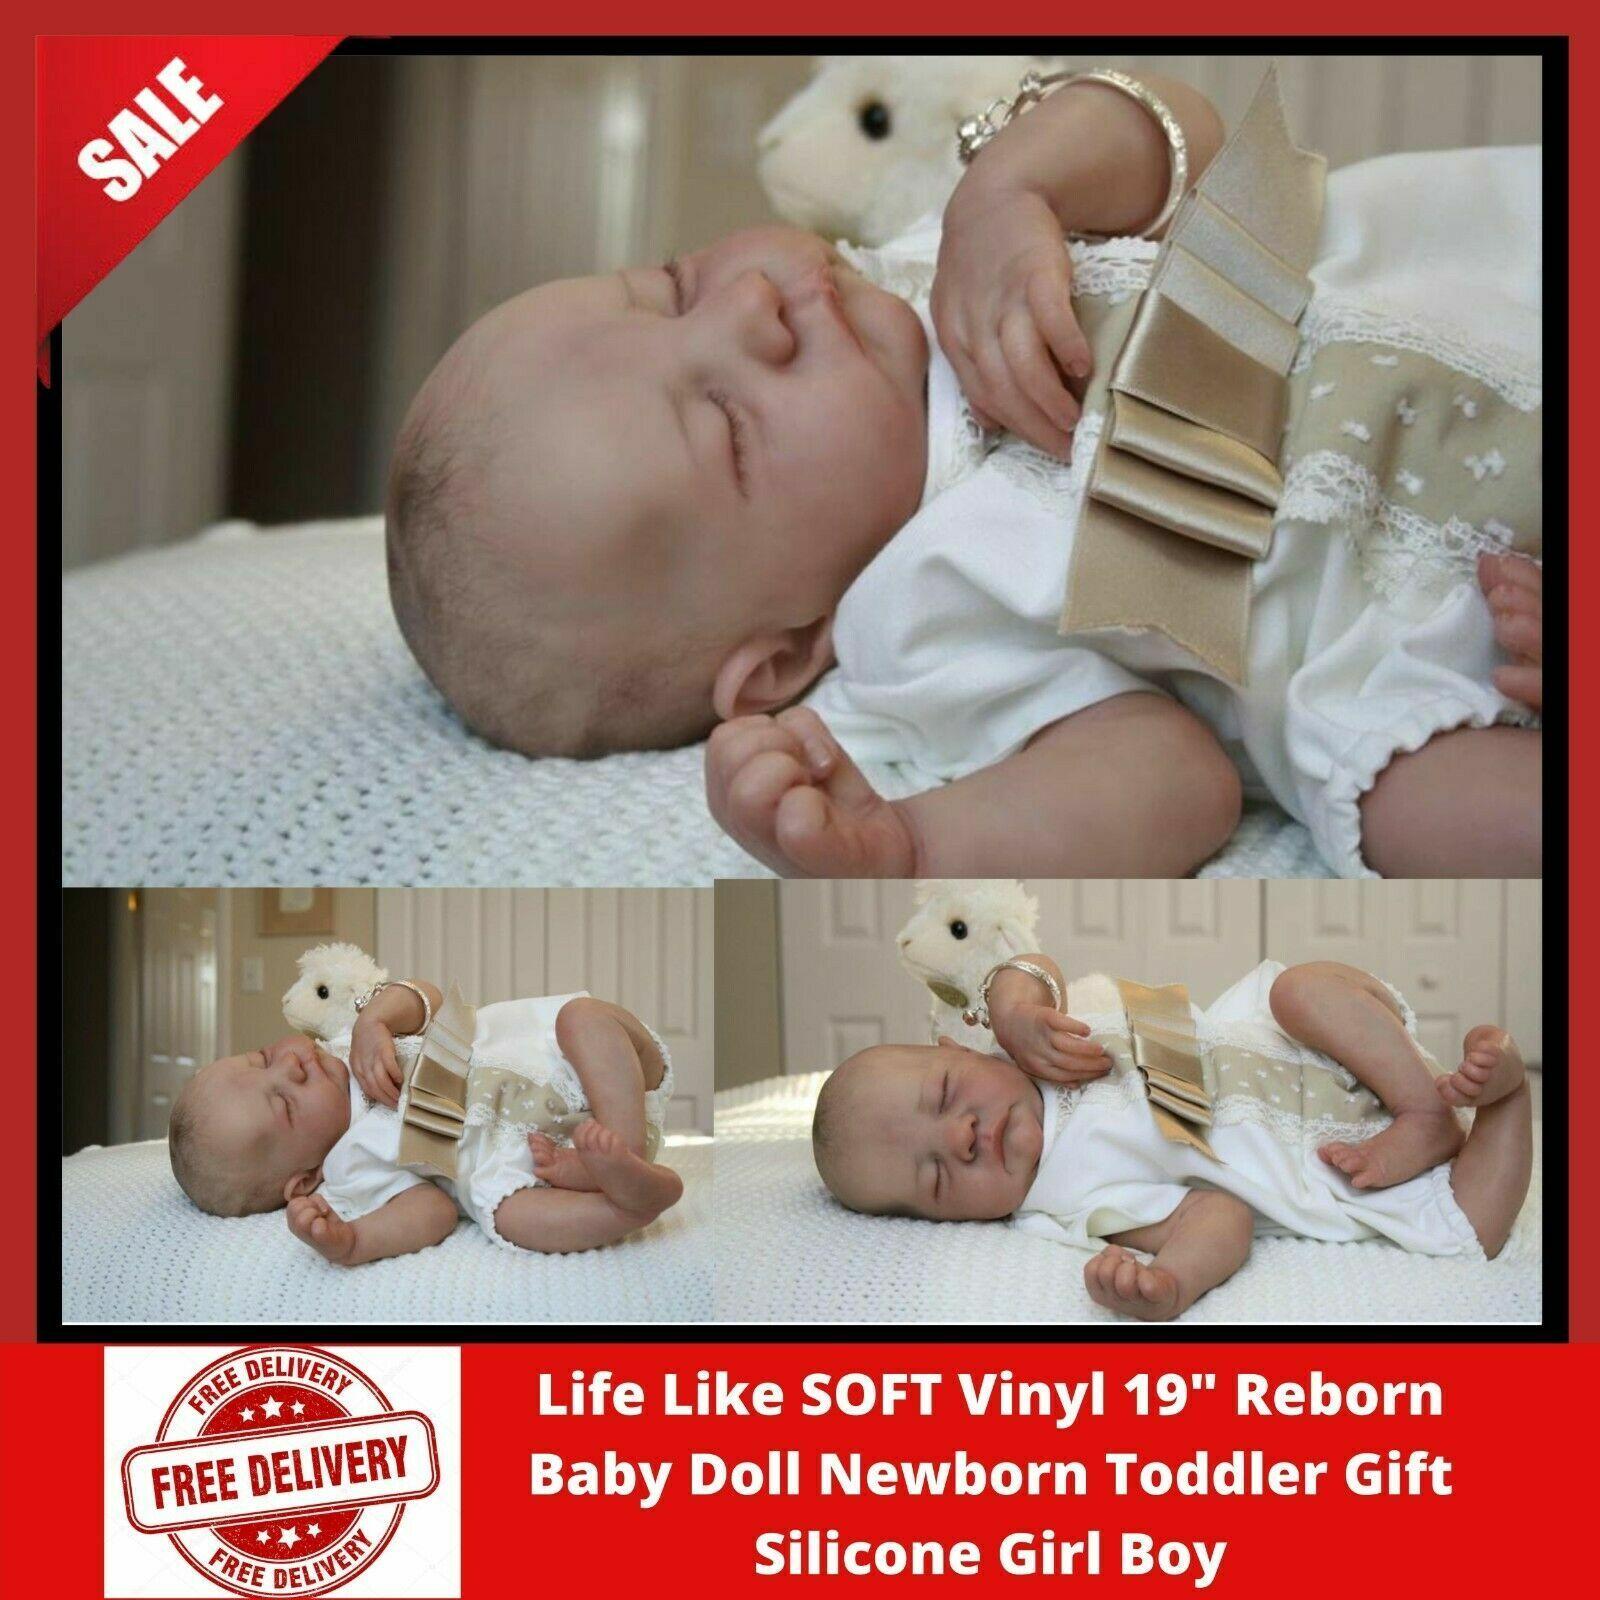 "SOFT Vinyl 19"" Reborn Baby Doll Newborn Toddler Gift Silicone Girl Boy"